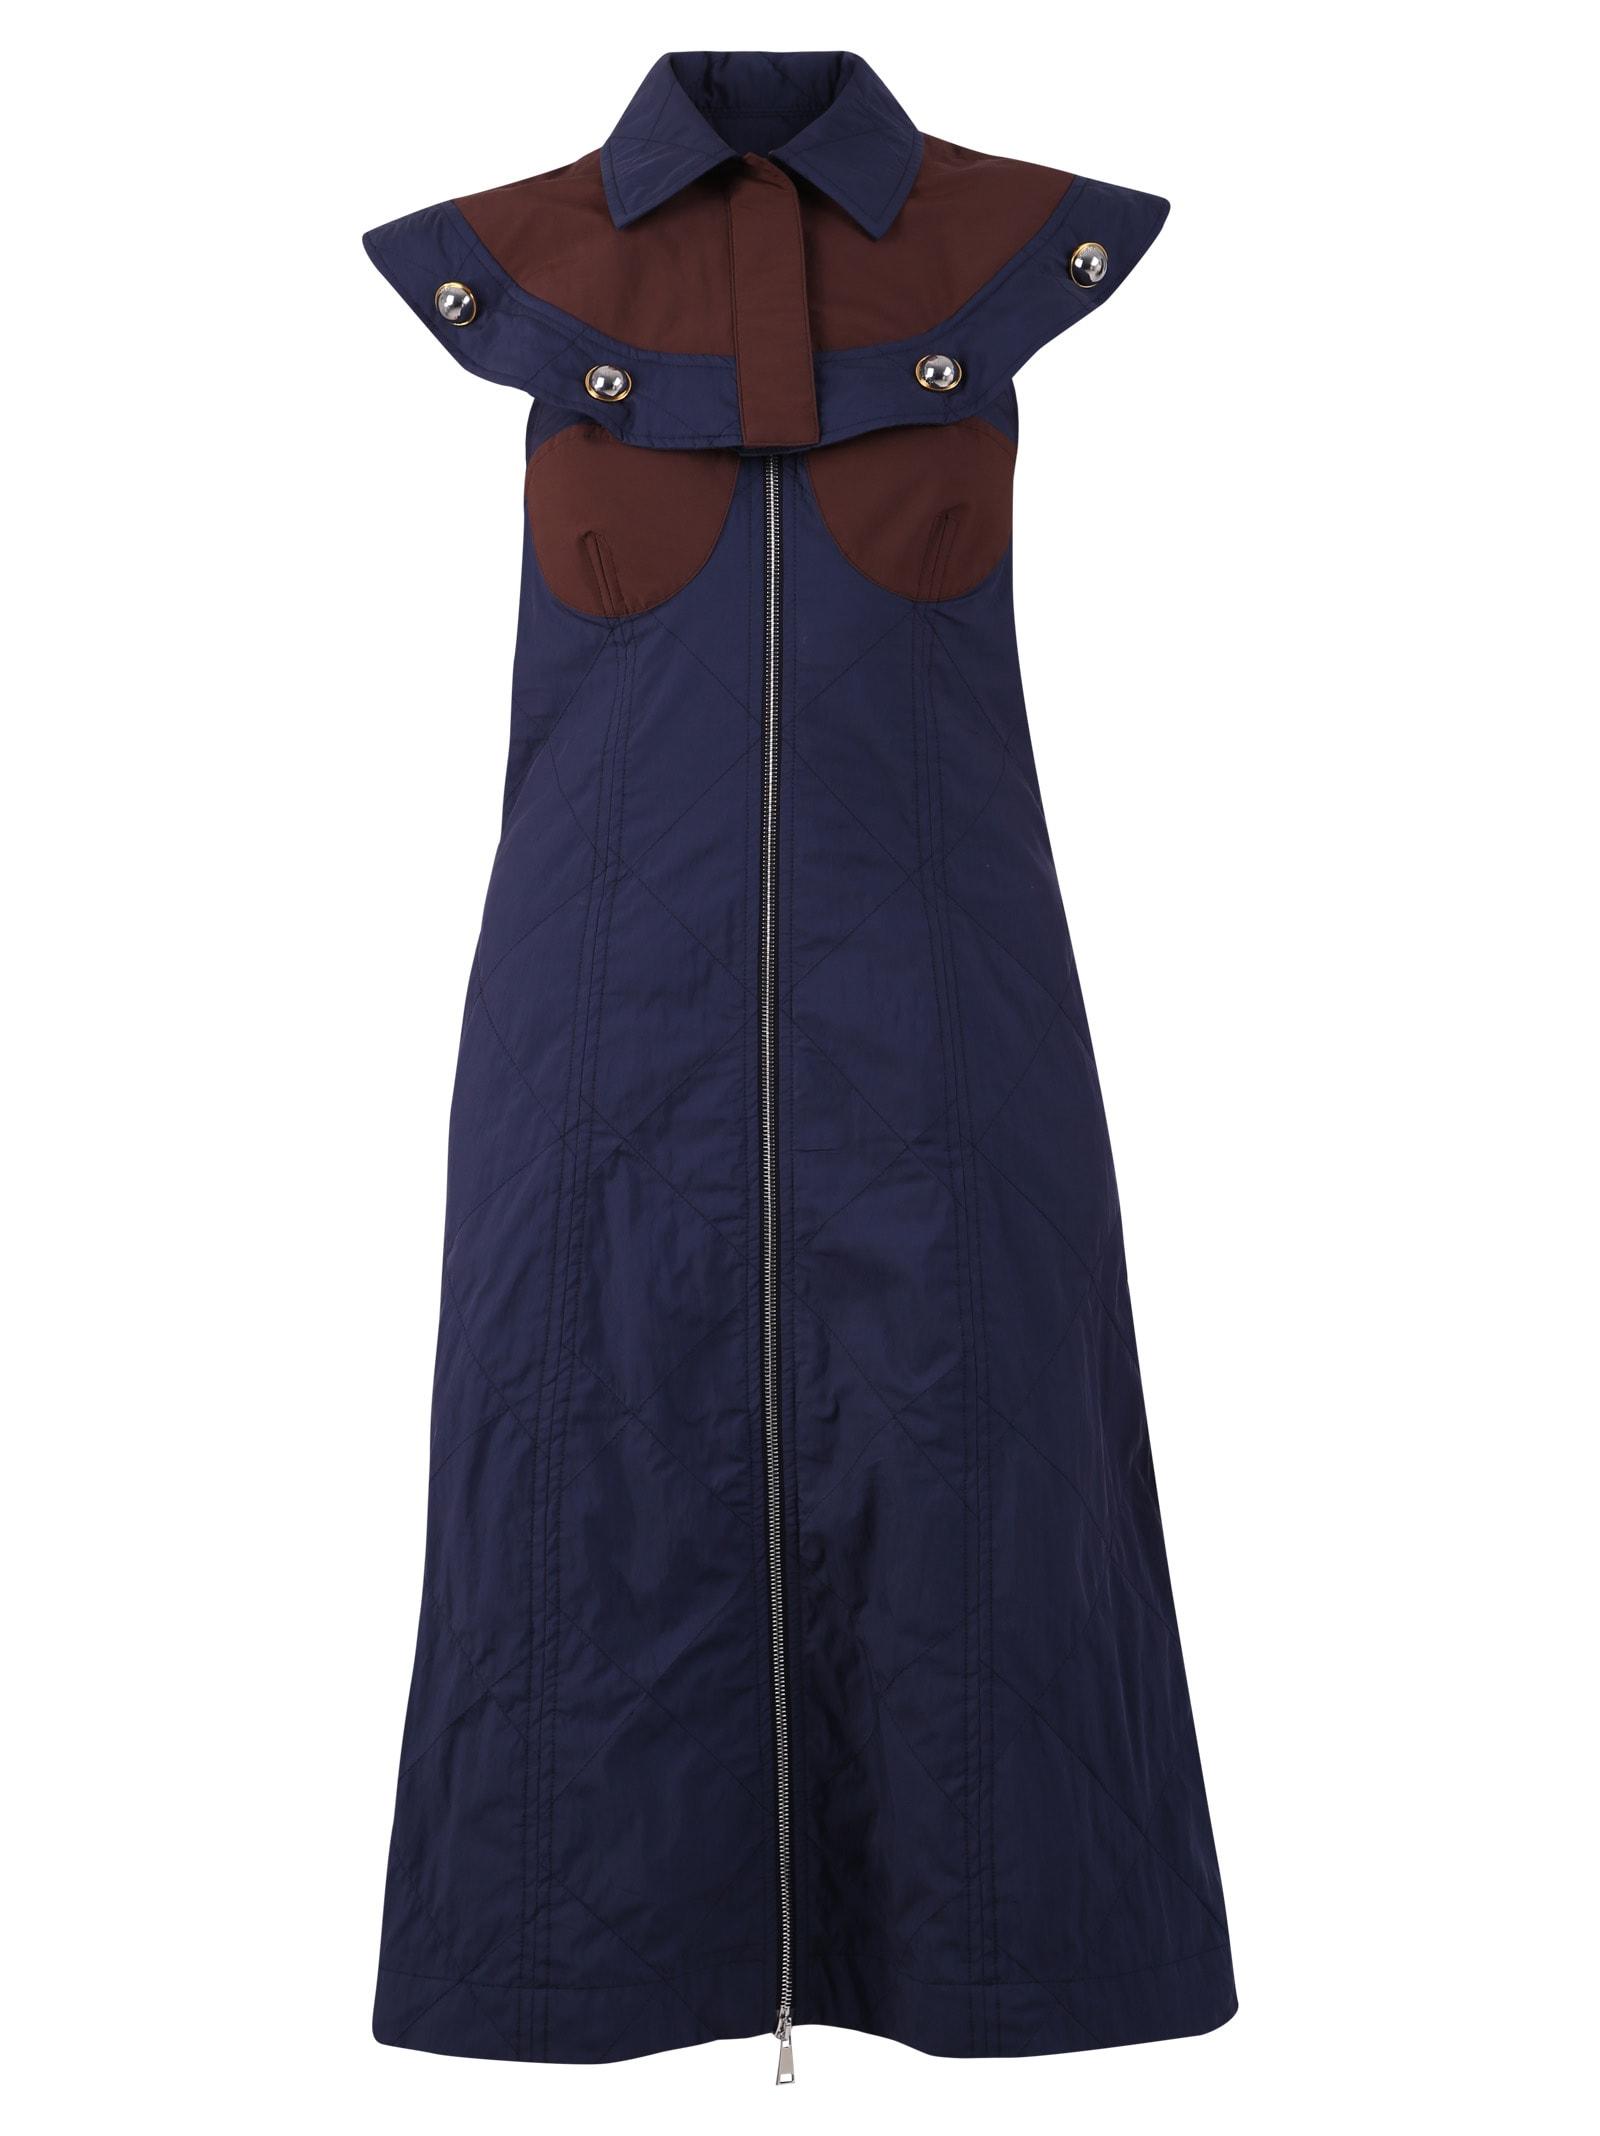 Buy Moncler Genius 2 Moncler 1952 - Dress online, shop Moncler Genius with free shipping